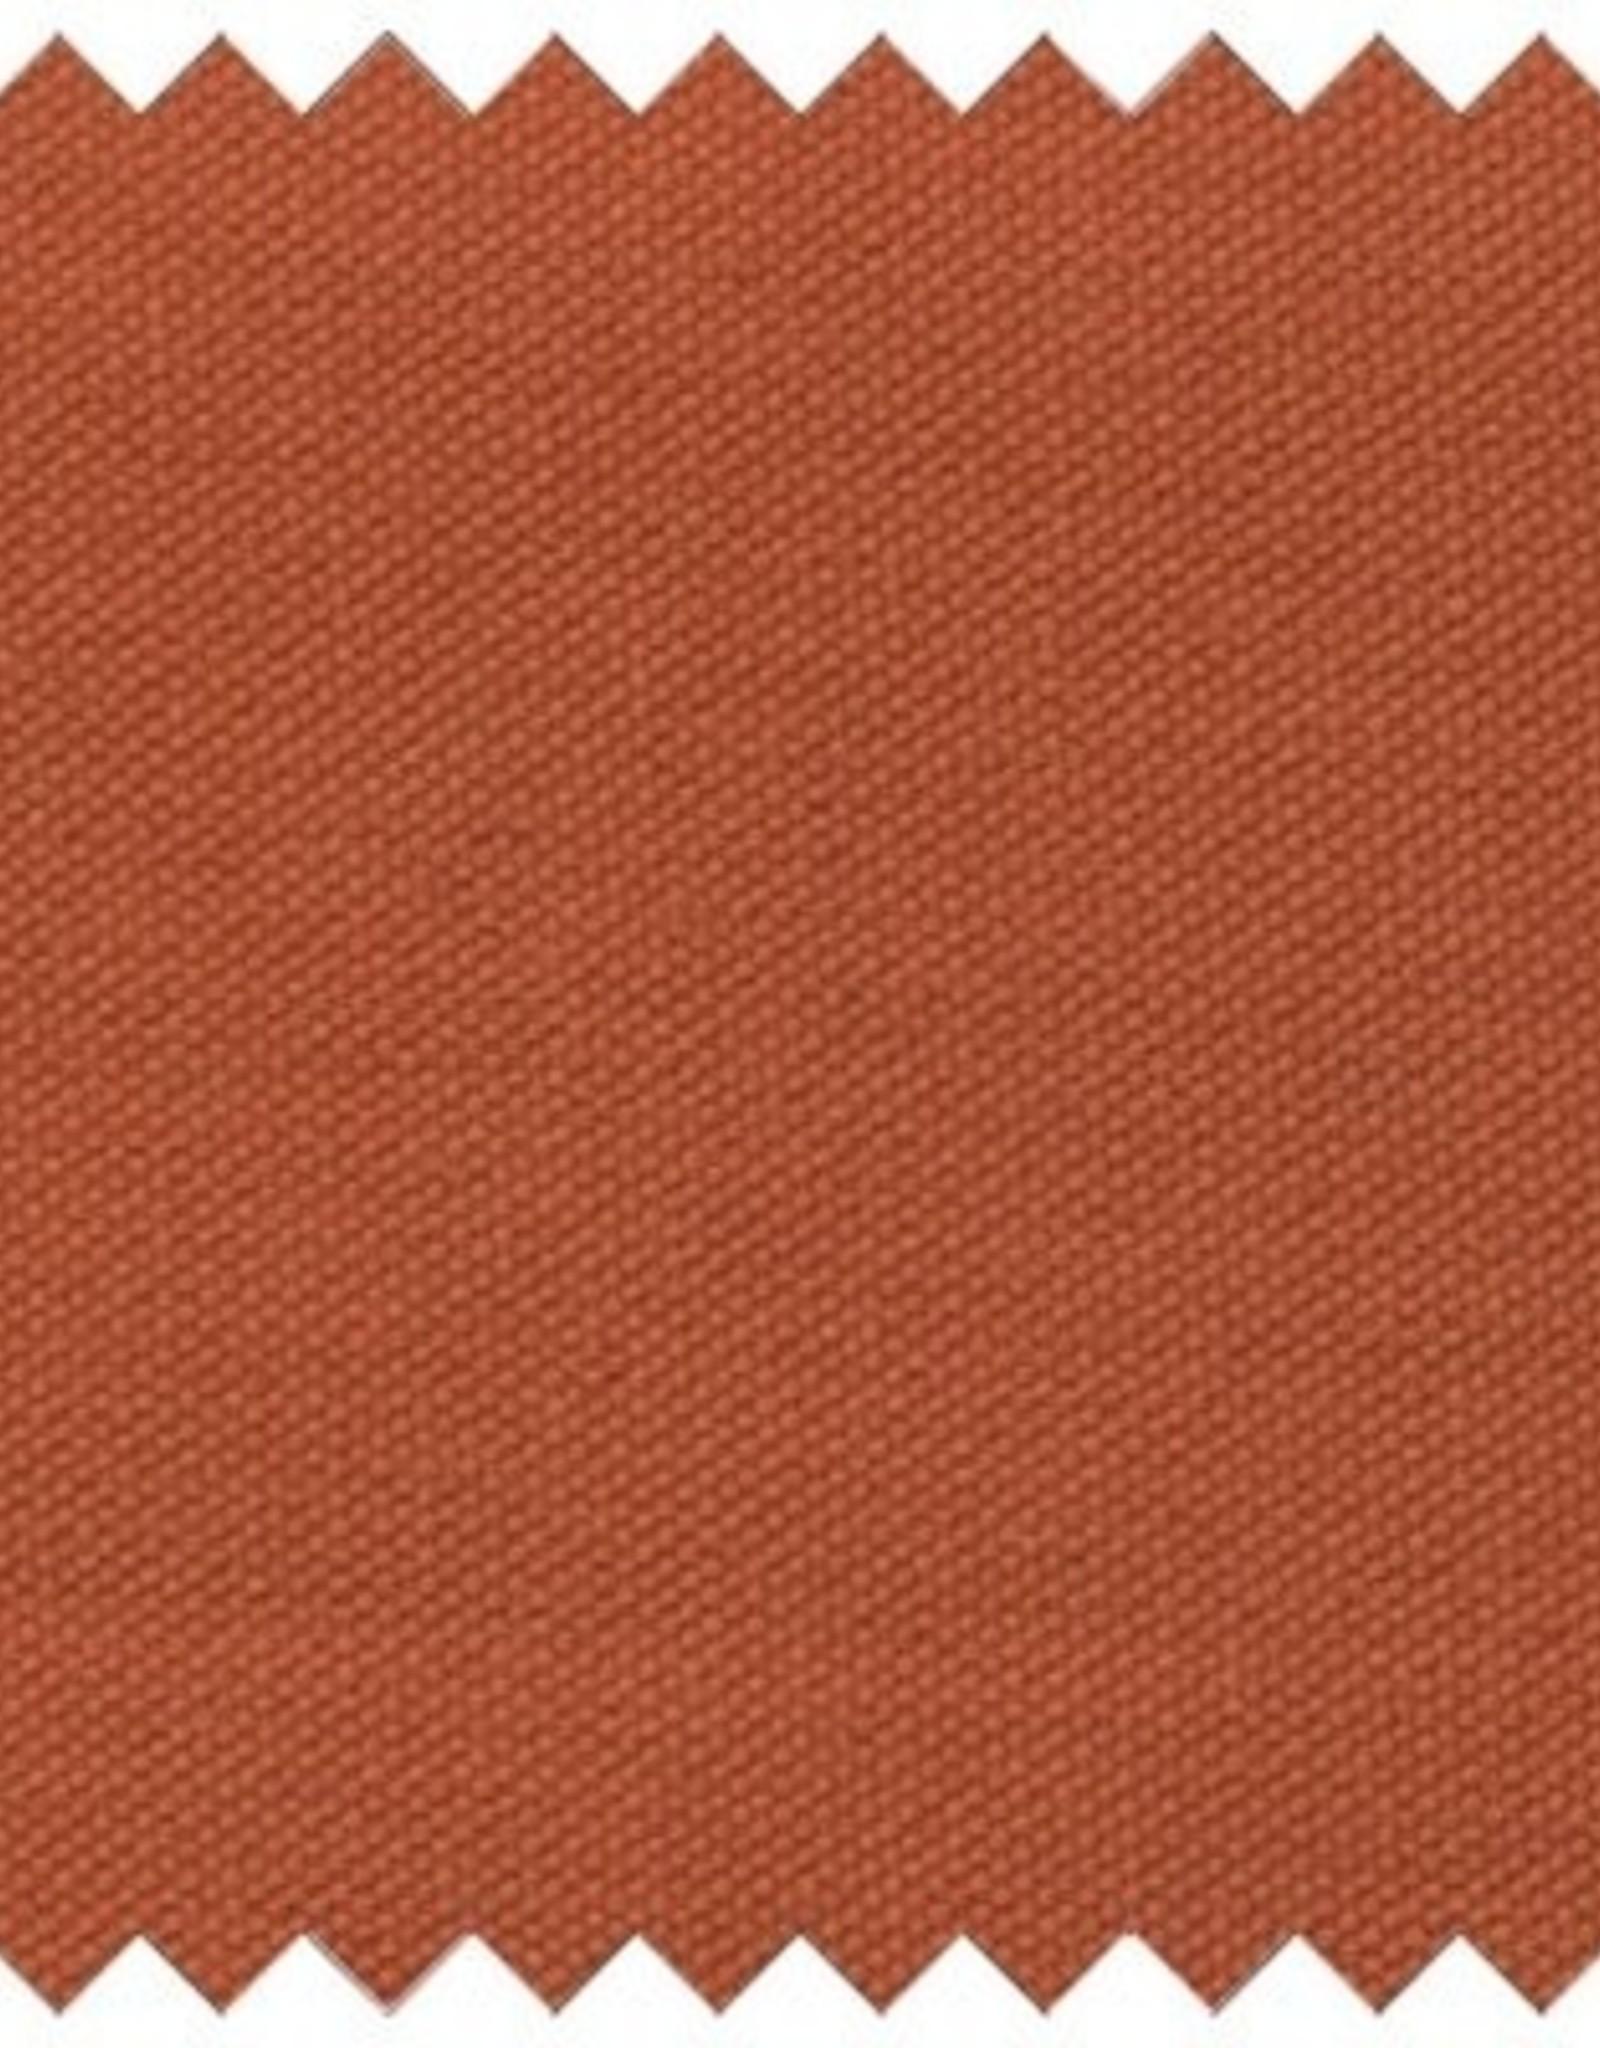 Carolina Morning Designs Buckwheat Zafu - Organic Pumpkin